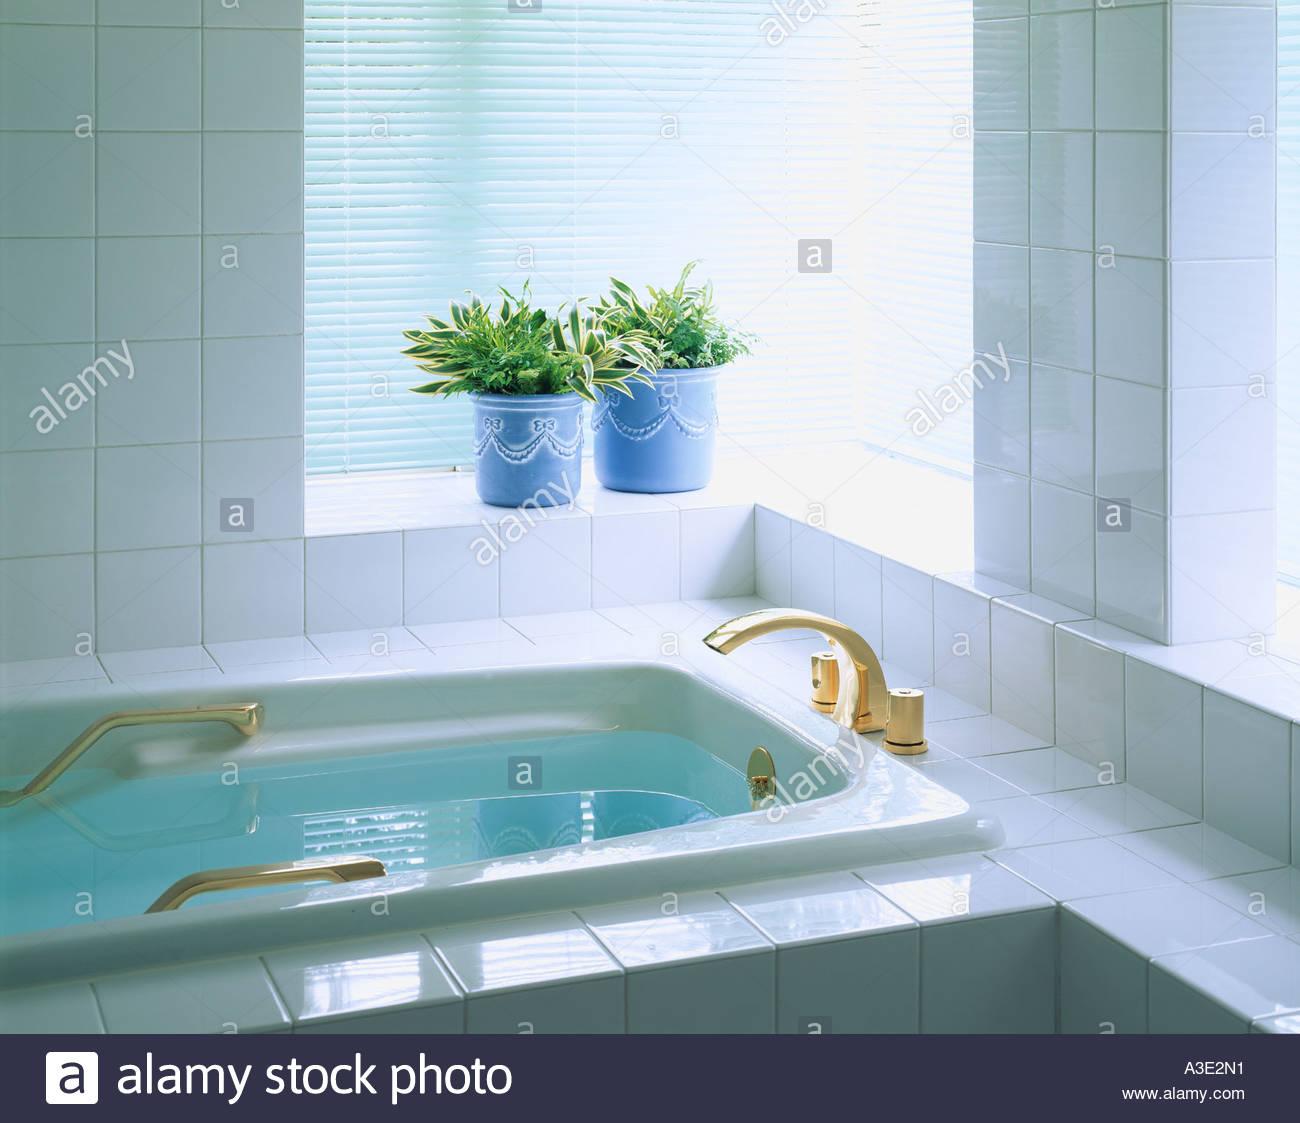 dracaena bath bathtub bathroom placethe window backlight stock